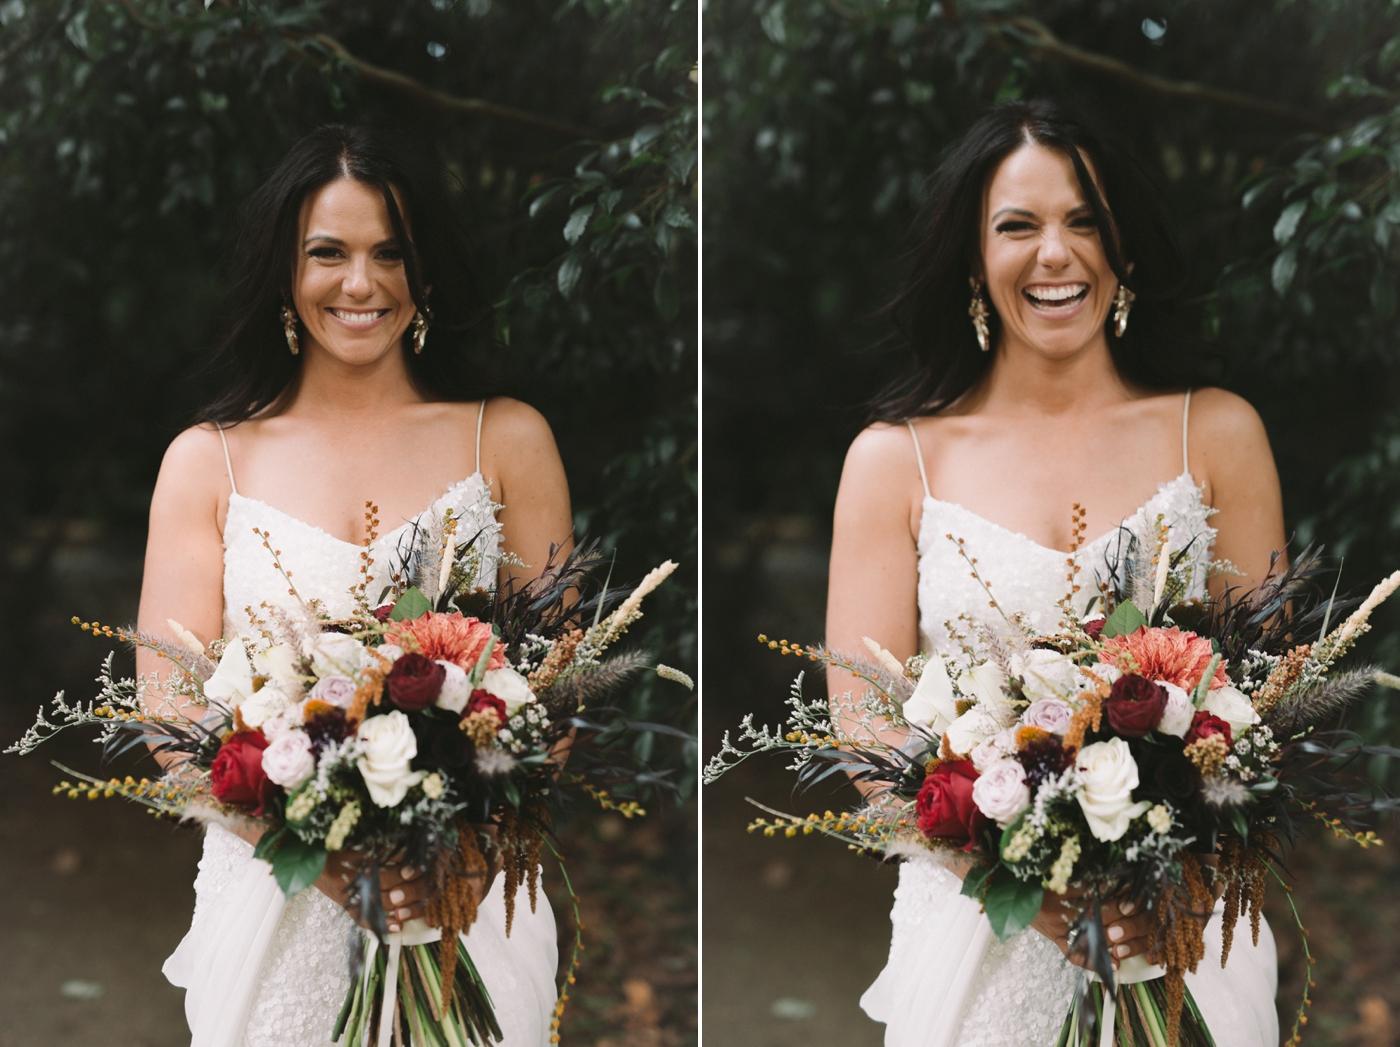 Kellie & Brent - Adelaide City Wedding - Natural wedding photography in Adelaide - Katherine Schultz - www.katherineschultzphotography.com 55